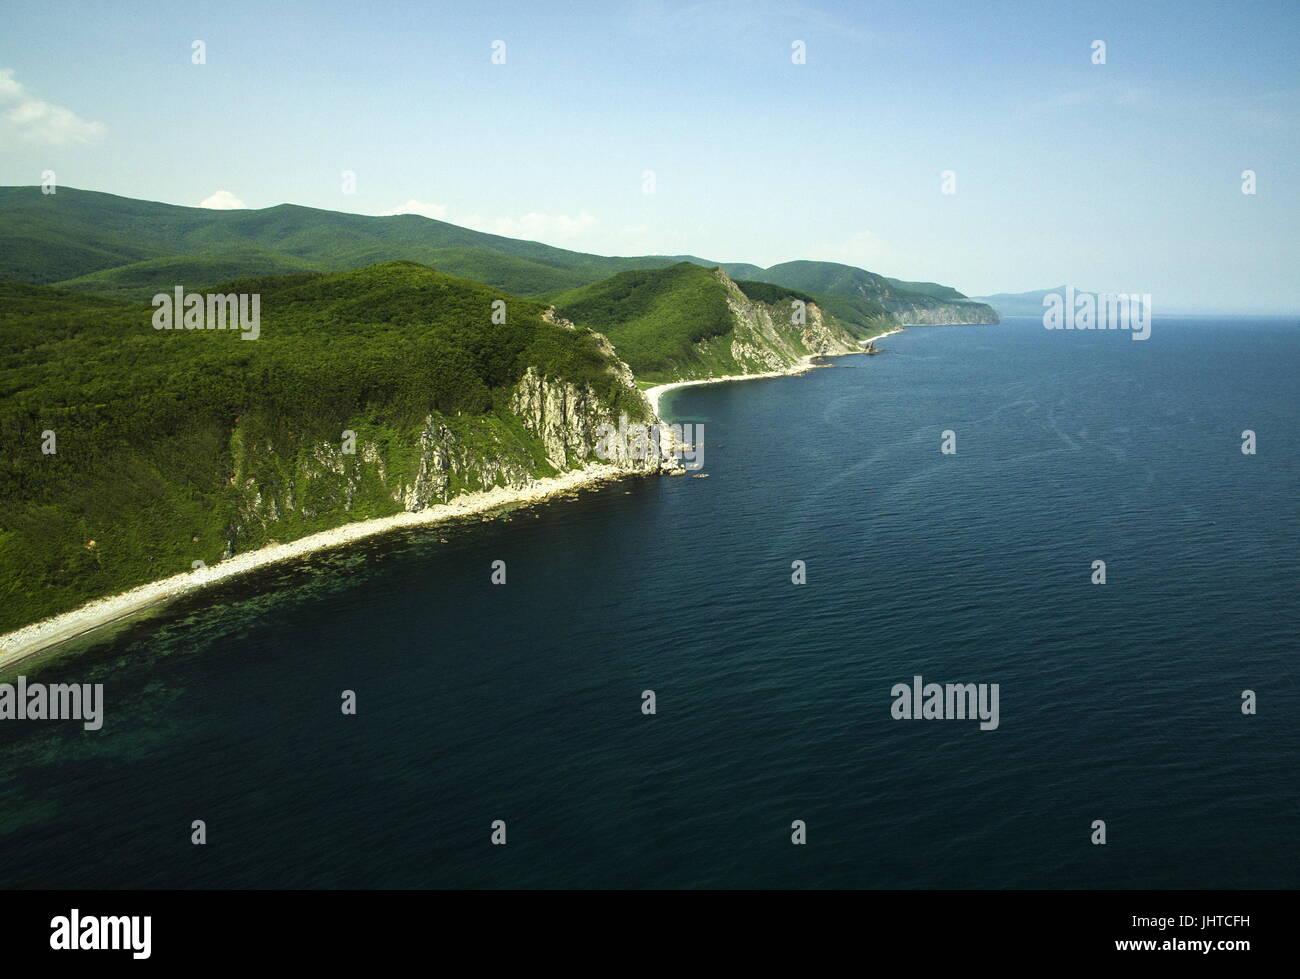 PRIMORYE TERRITORY, RUSSIA – JUNE 29, 2017: Sea of Japan coast at the Sikhote-Alin Nature Reserve in Russian Far Stock Photo